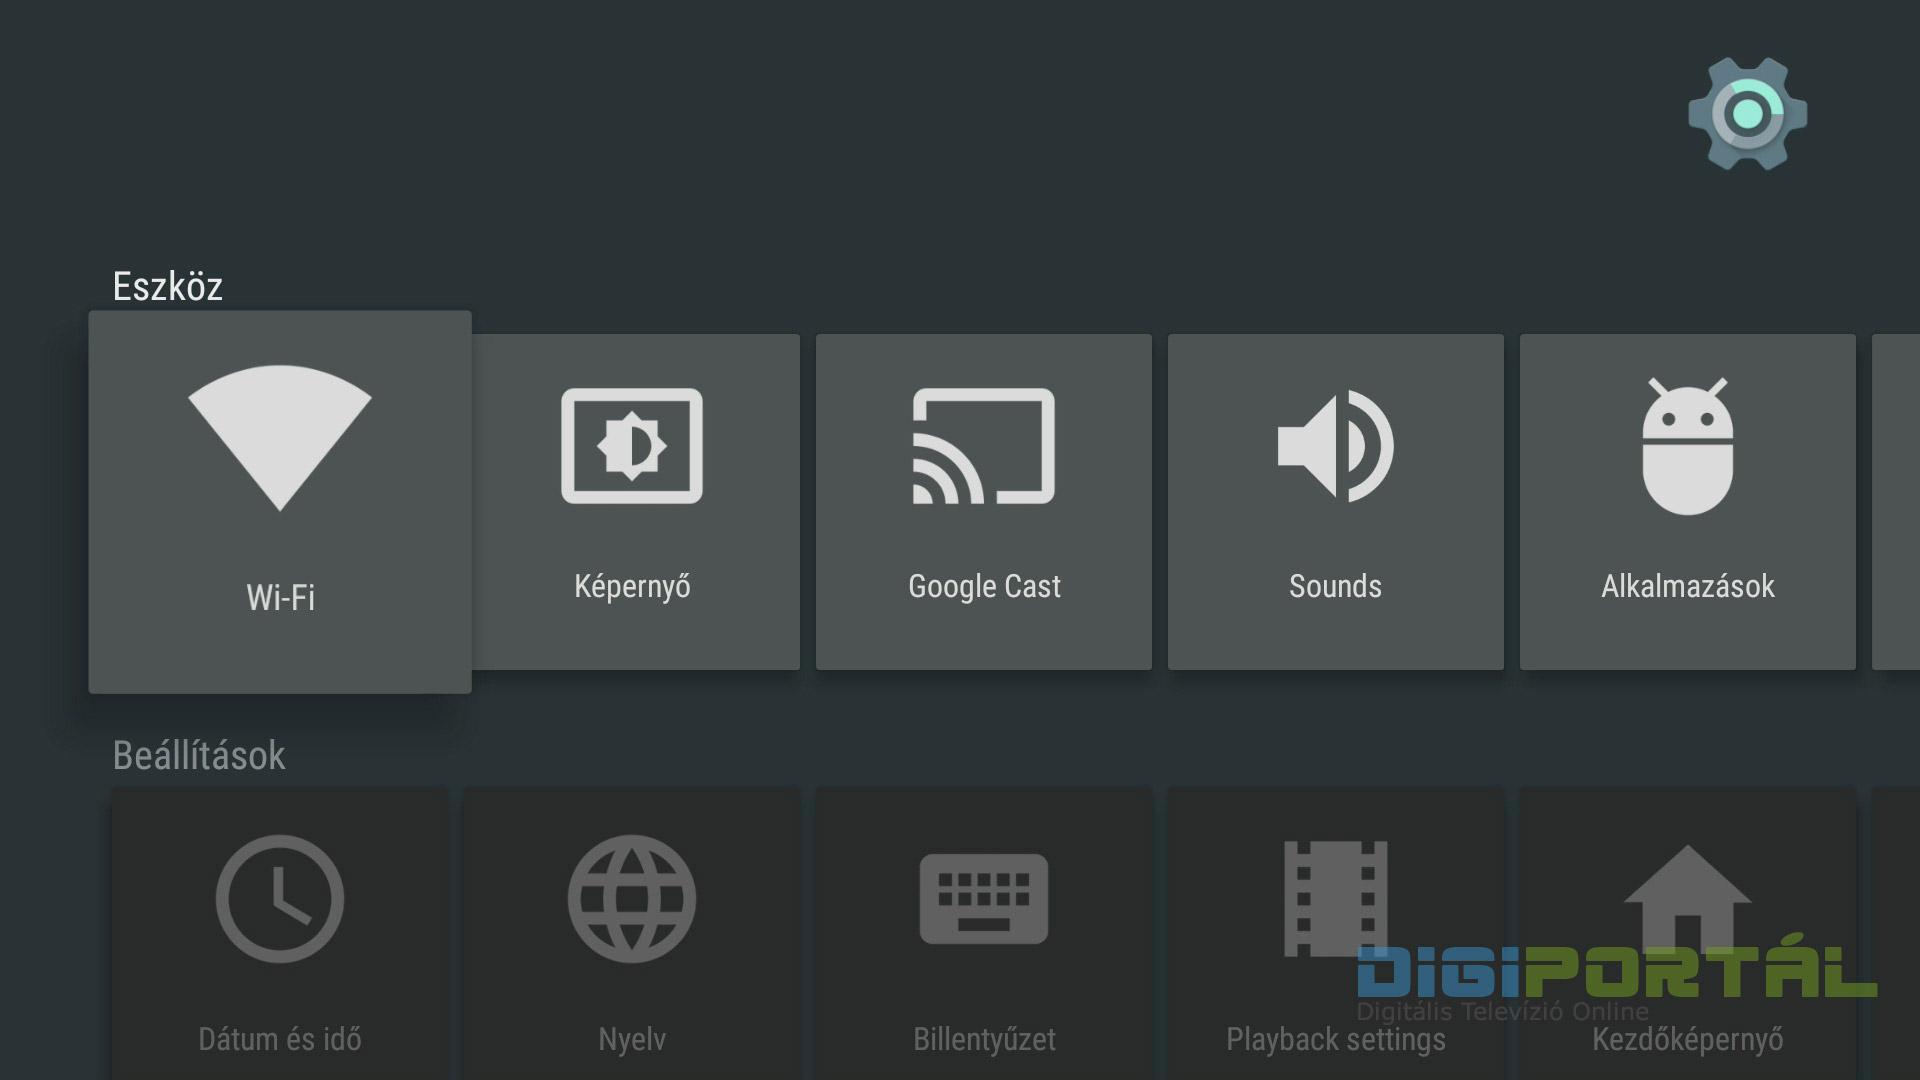 xiaomi-mi-box-3-4k-tv-box-screen-03 – DigiPortál – Digitális ... 4cbb92ab86